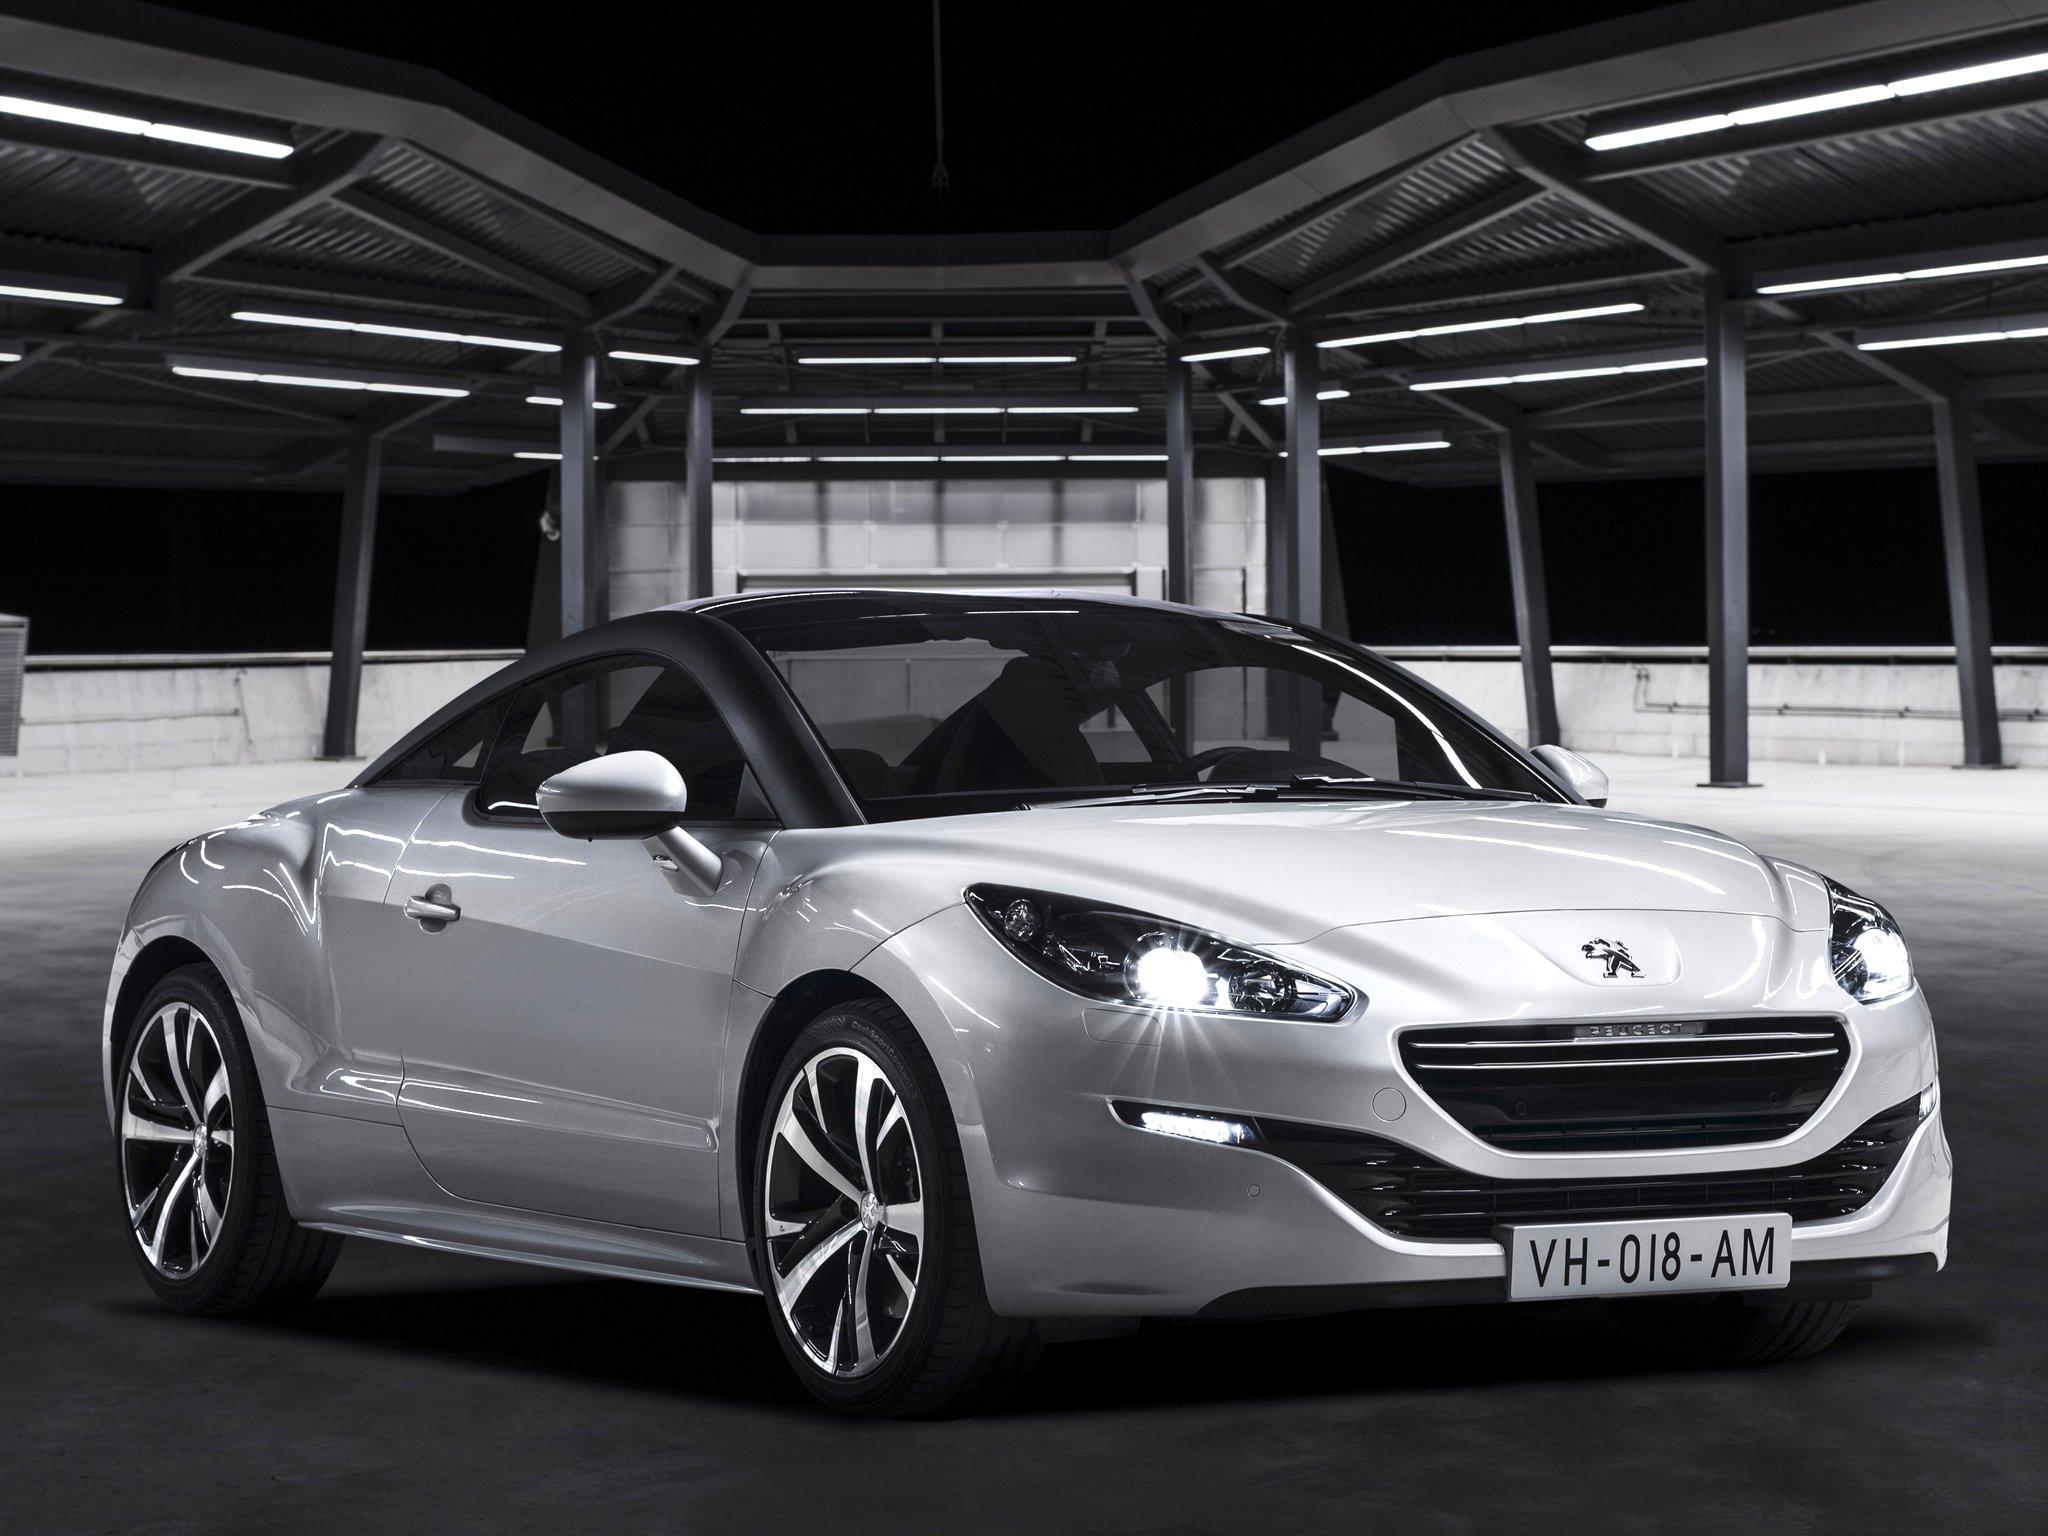 Peugeot RCZ price revised - RM272k for auto variant